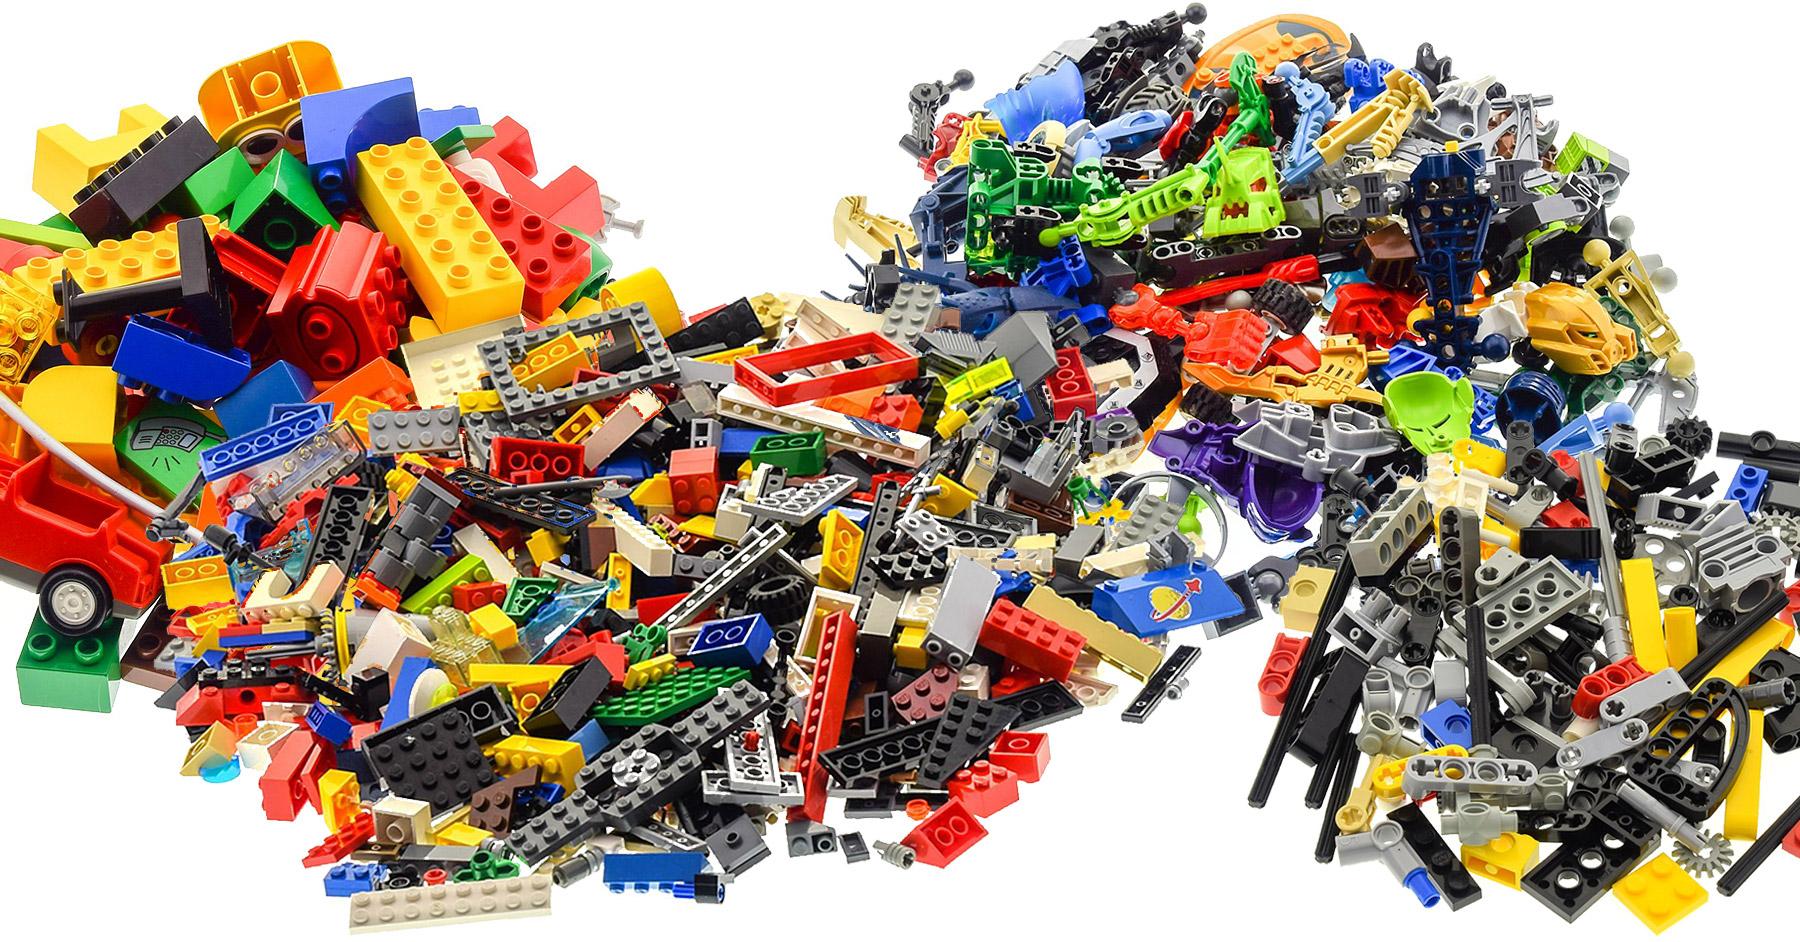 lego-kiloware-verschiedene-sets